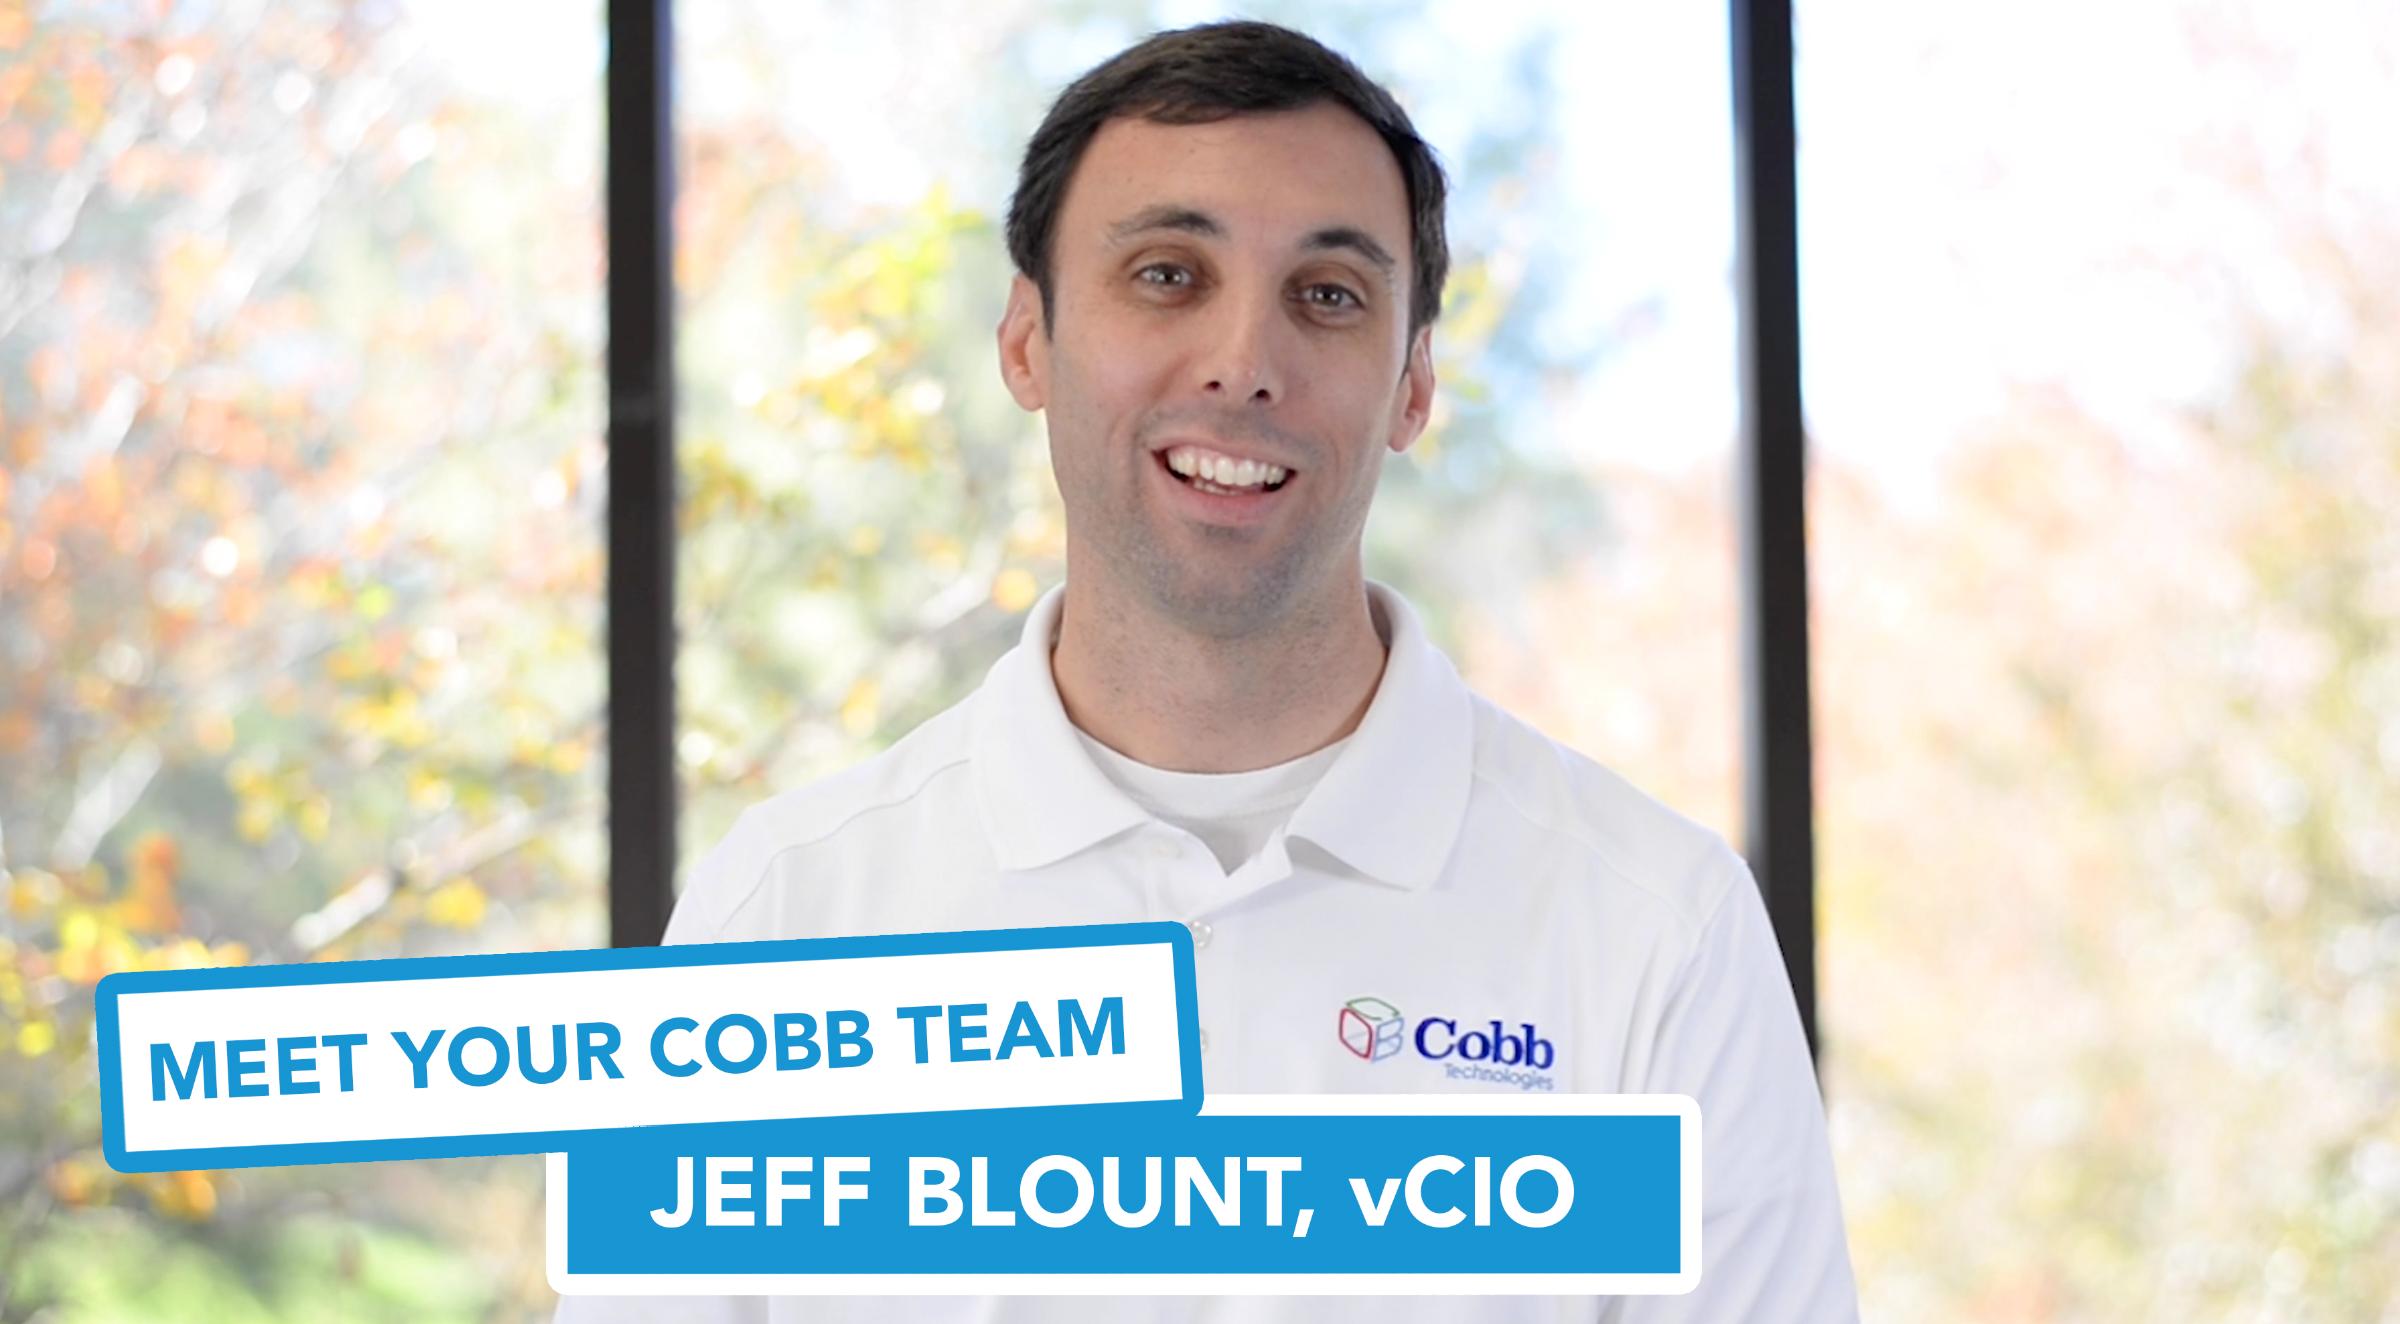 Meet Your Cobb Team - Jeff Blount, vCIO